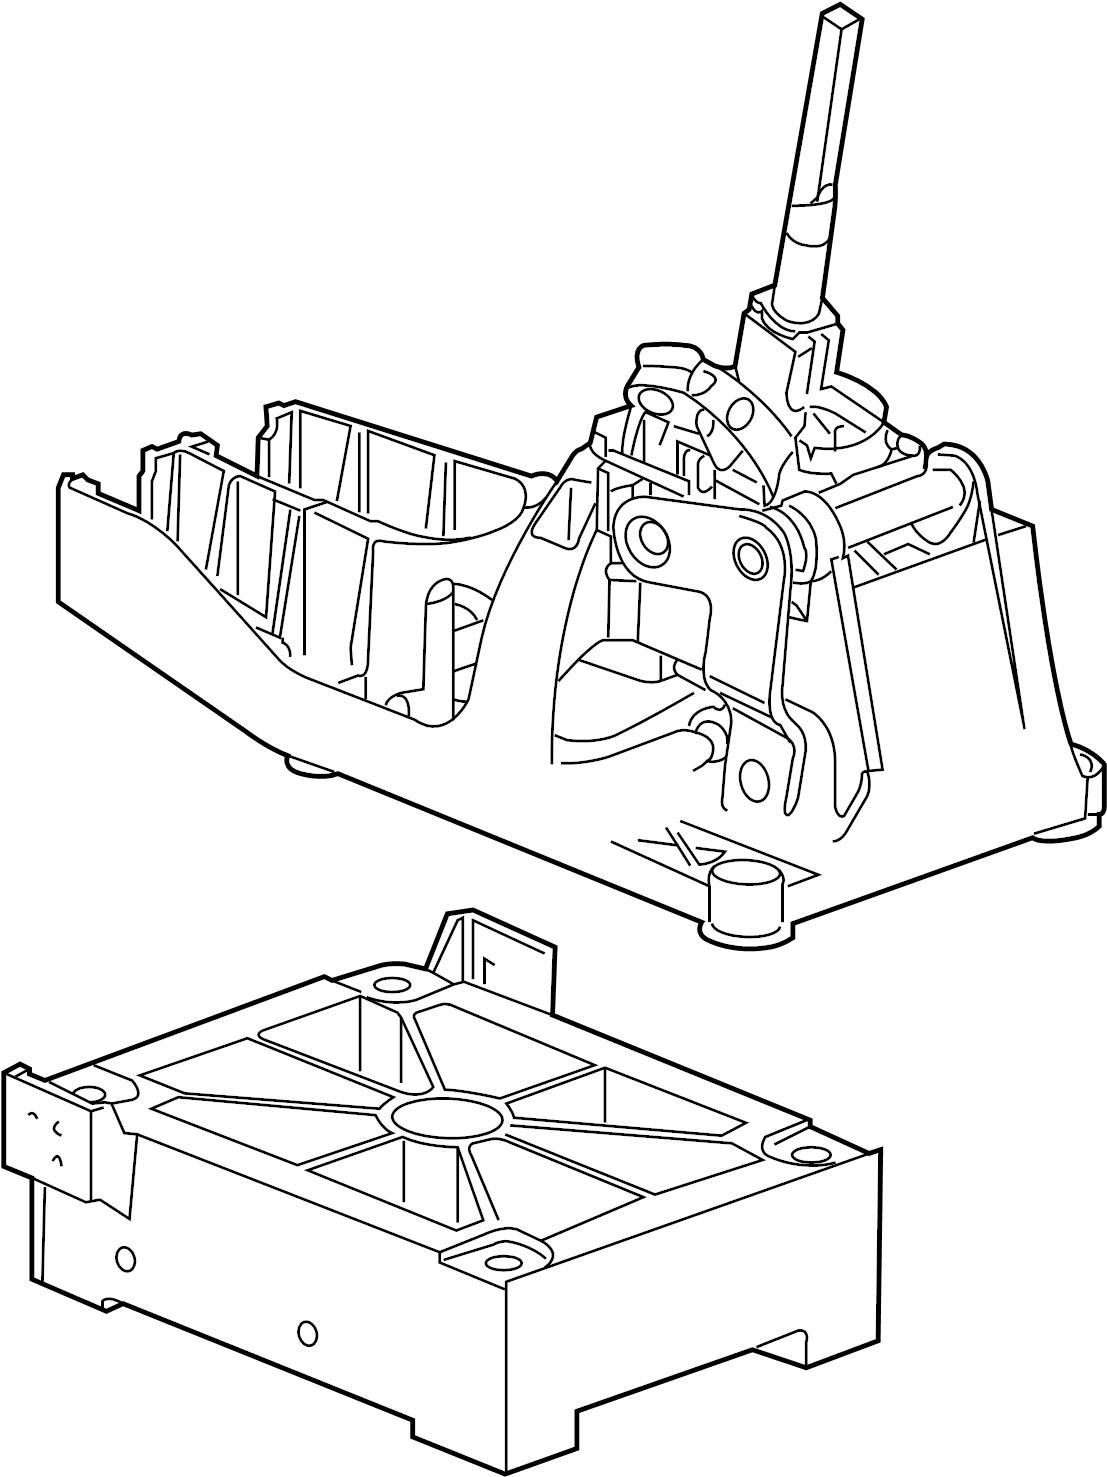 2016 buick regal manual transmission